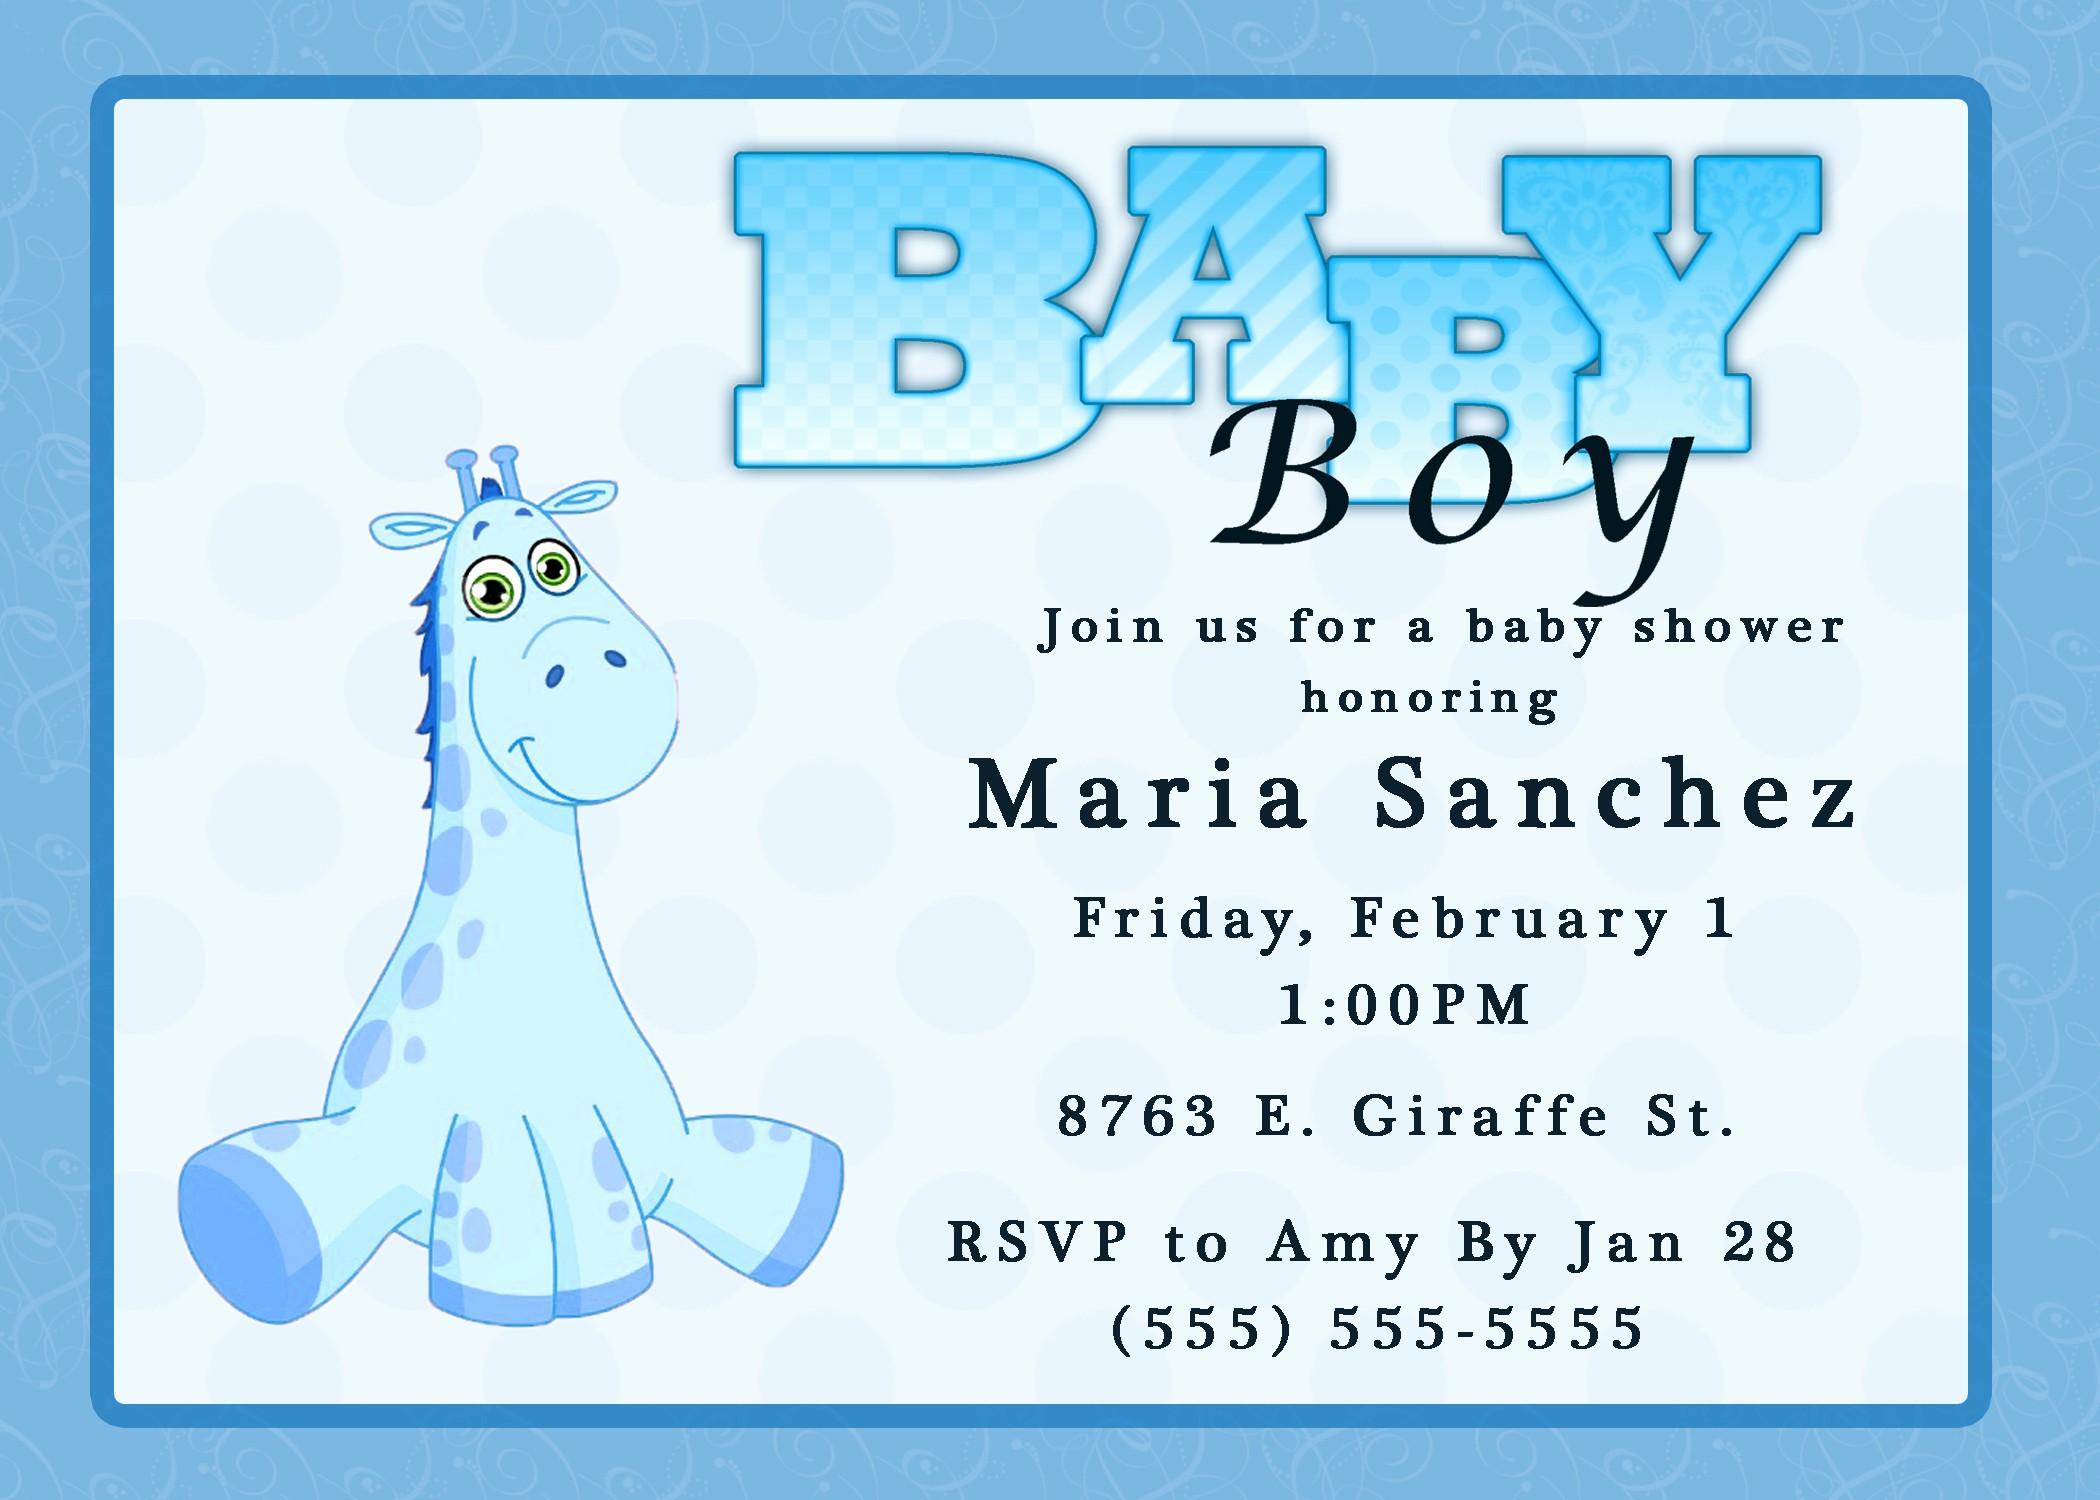 Baby Shower Invitation List Template Luxury Free Baby Boy Shower Invitations Templates Baby Boy